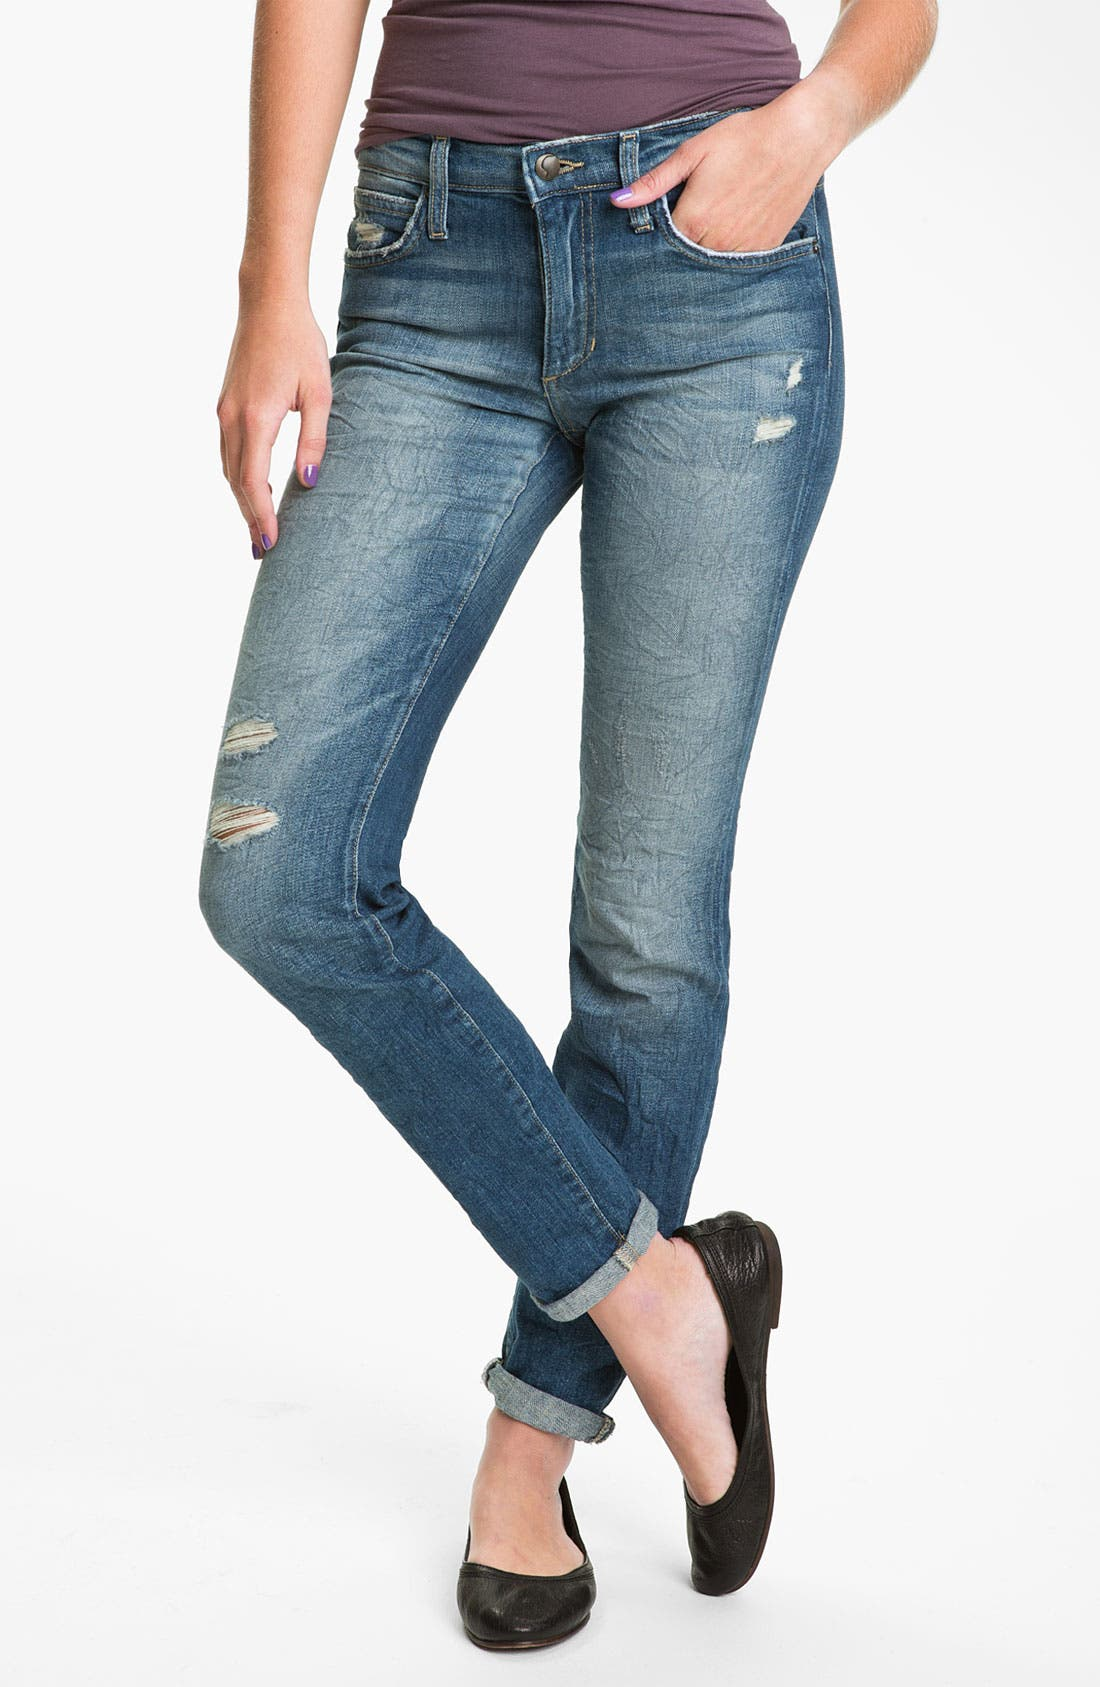 Alternate Image 1 Selected - Joe's Distressed Skinny Stretch Jeans (Renah)